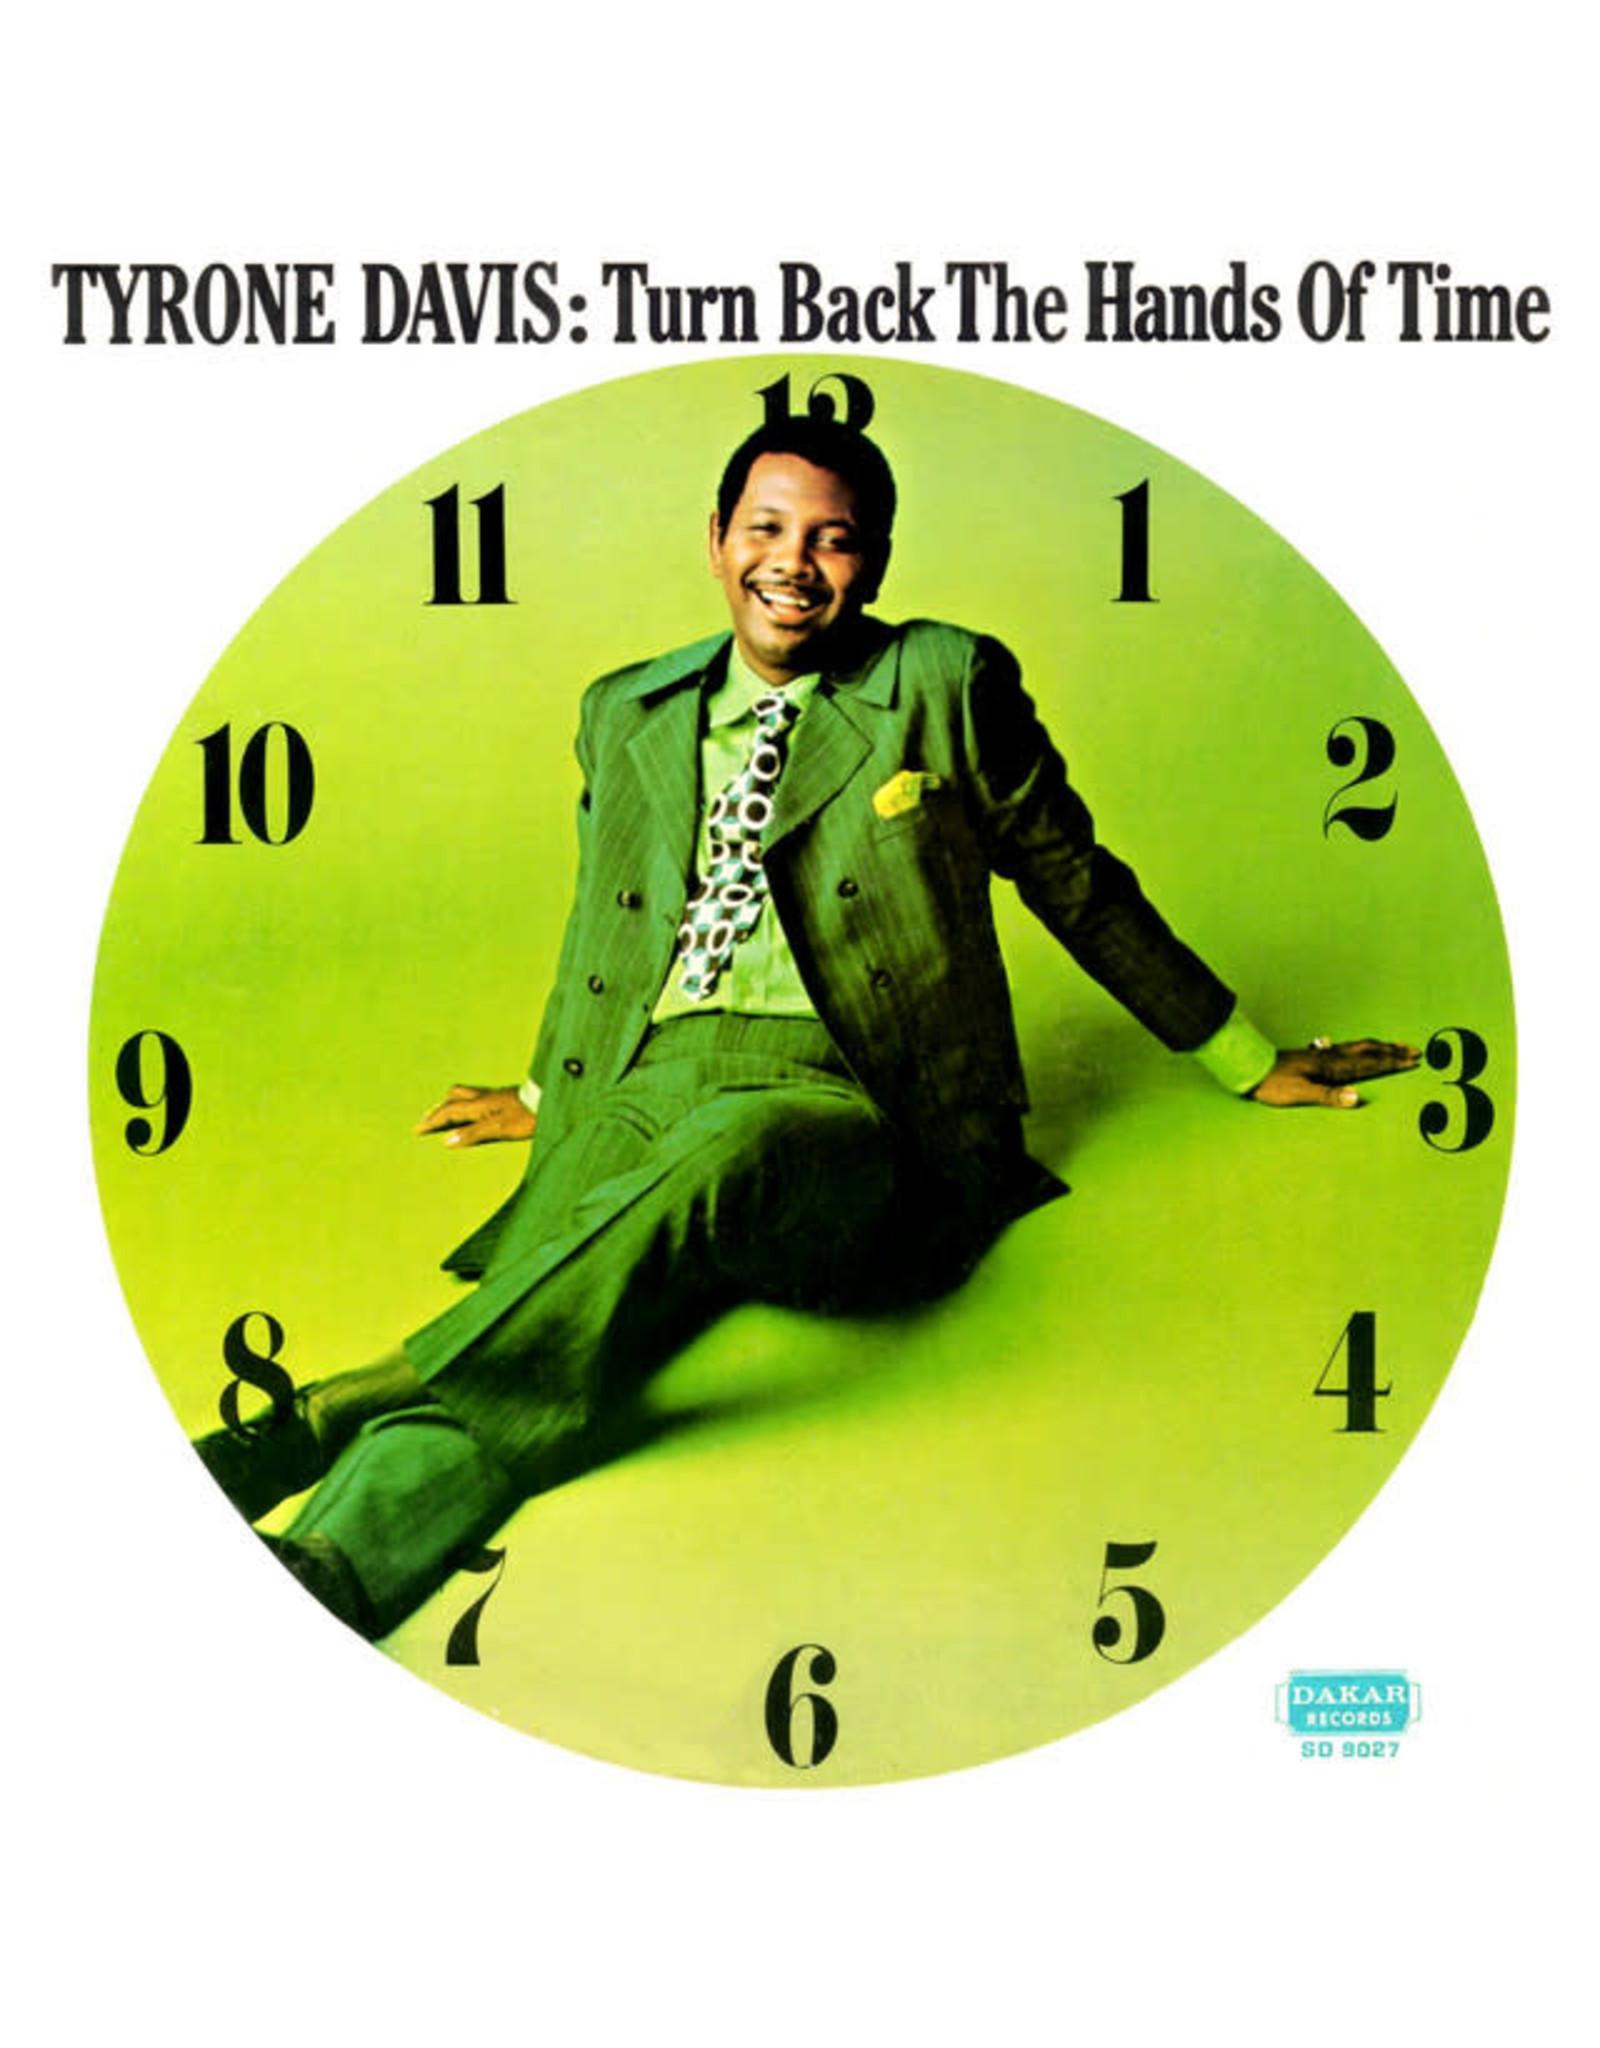 Vinyl Tyrone Davis - Turn Back The Hands Of Time